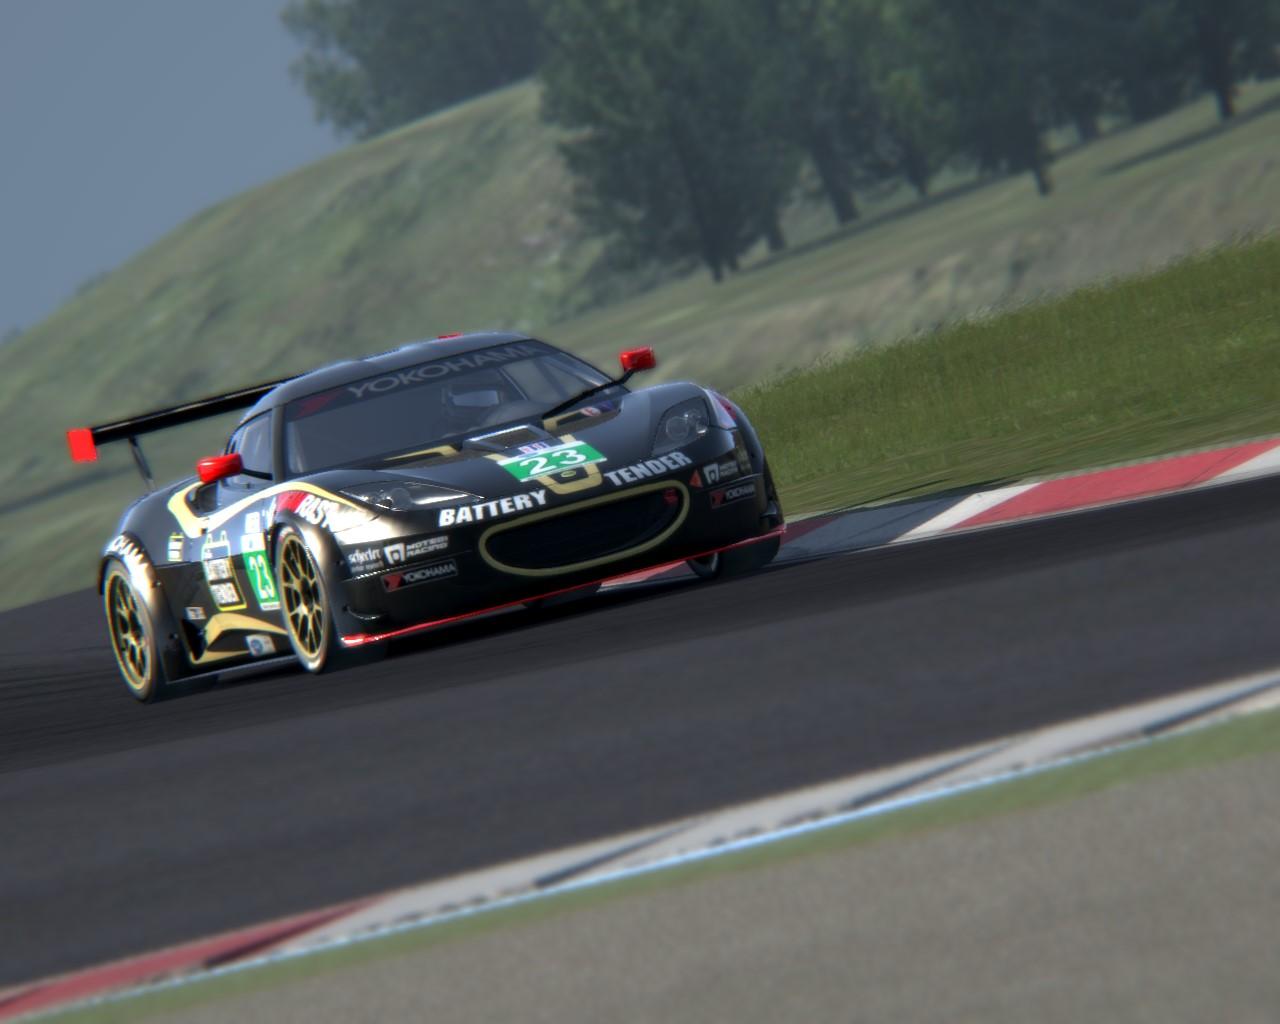 Vallelunga Lotus Evora GTC Track Day 1